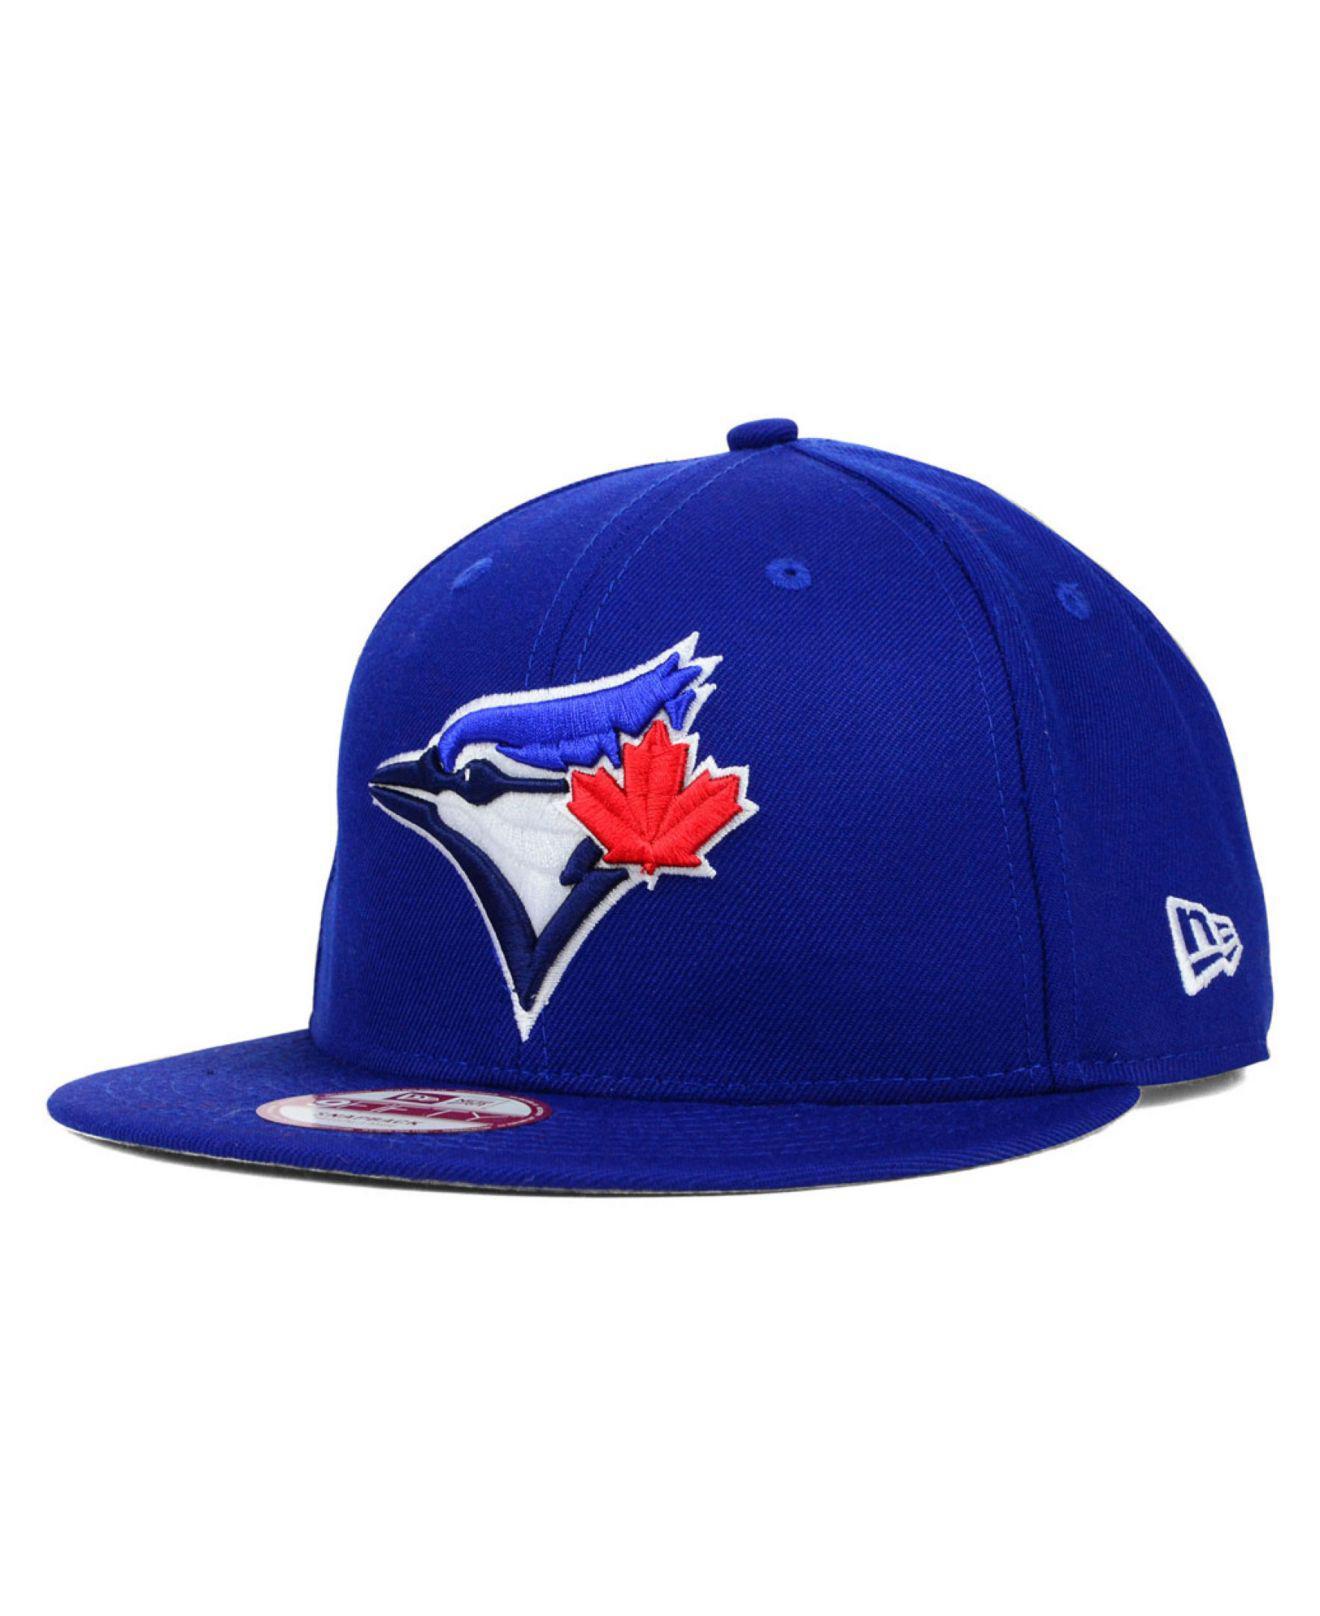 9682bf815b9 Lyst - KTZ Toronto Blue Jays 2 Tone Link 9fifty Snapback Cap in Blue ...